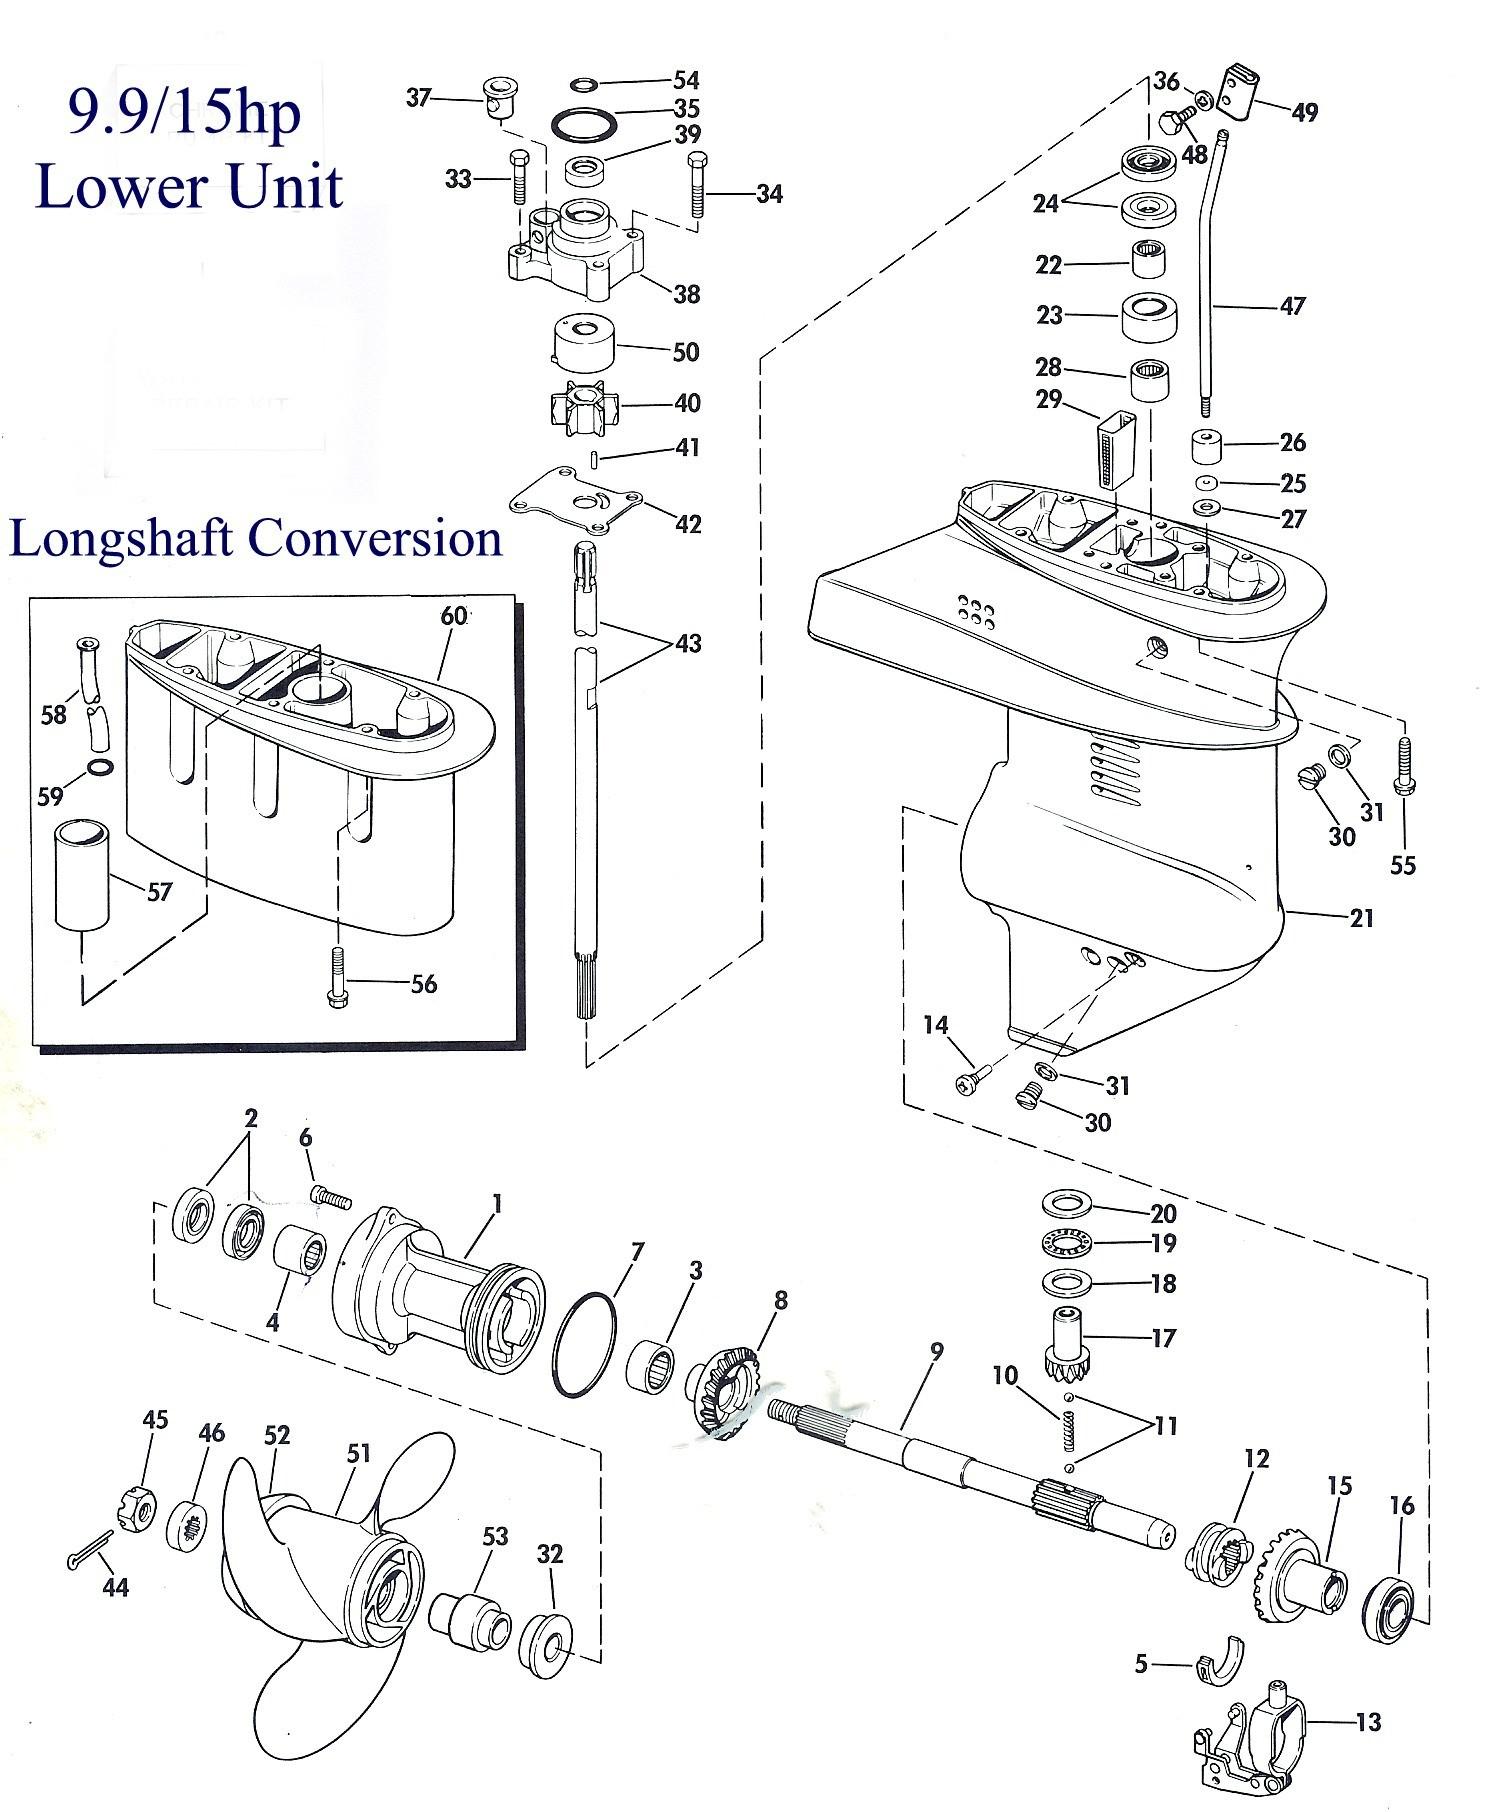 15 Hp Evinrude Parts Diagram Lower Unit Of 15 Hp Evinrude Parts Diagram